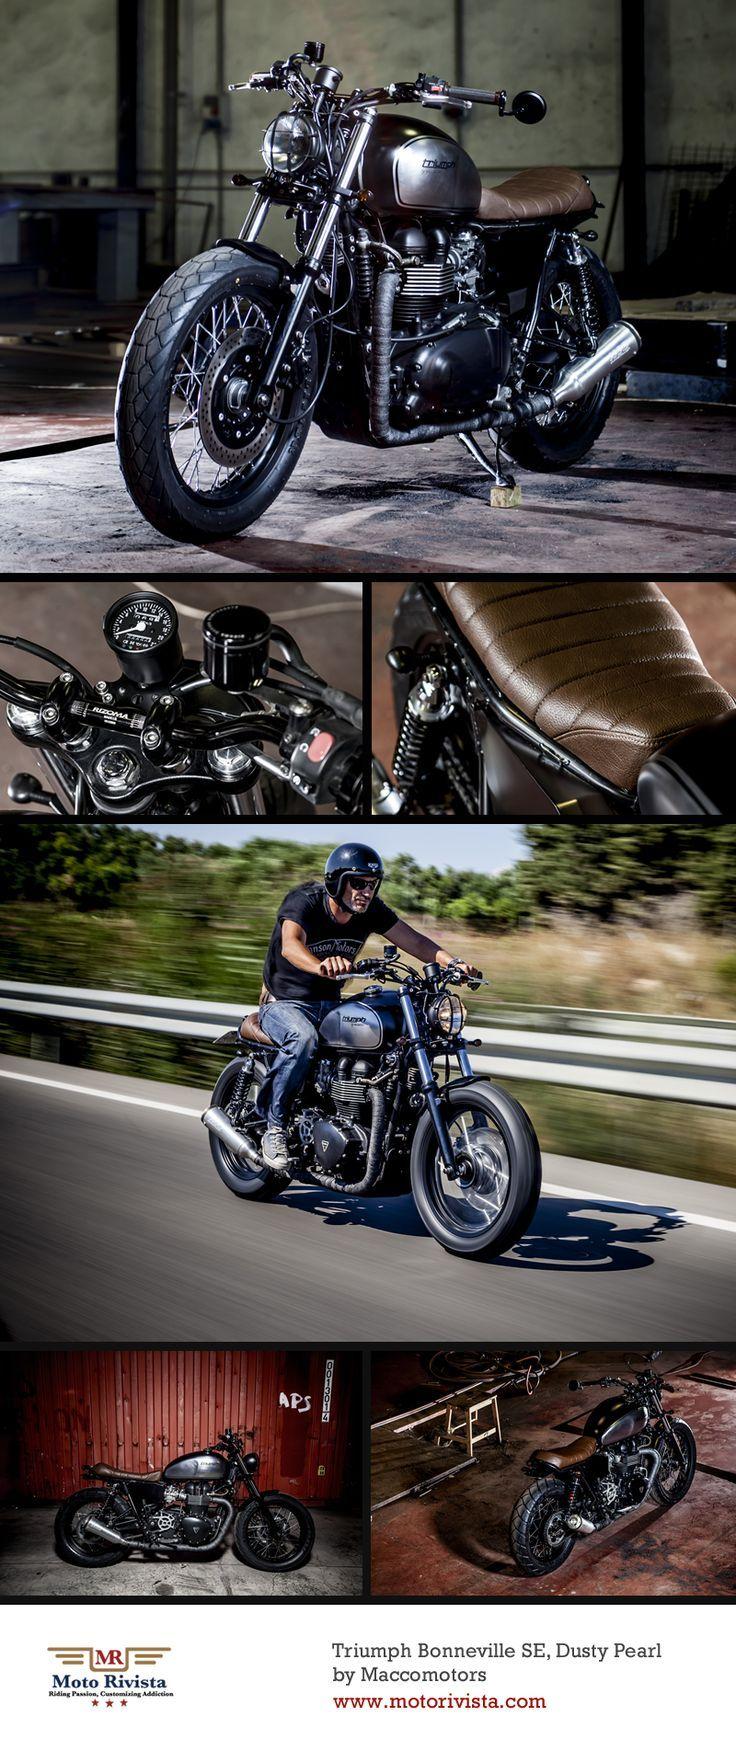 #Triumph #Bonneville SE Custom by Maccomotors ~ Featured on Moto Rivista